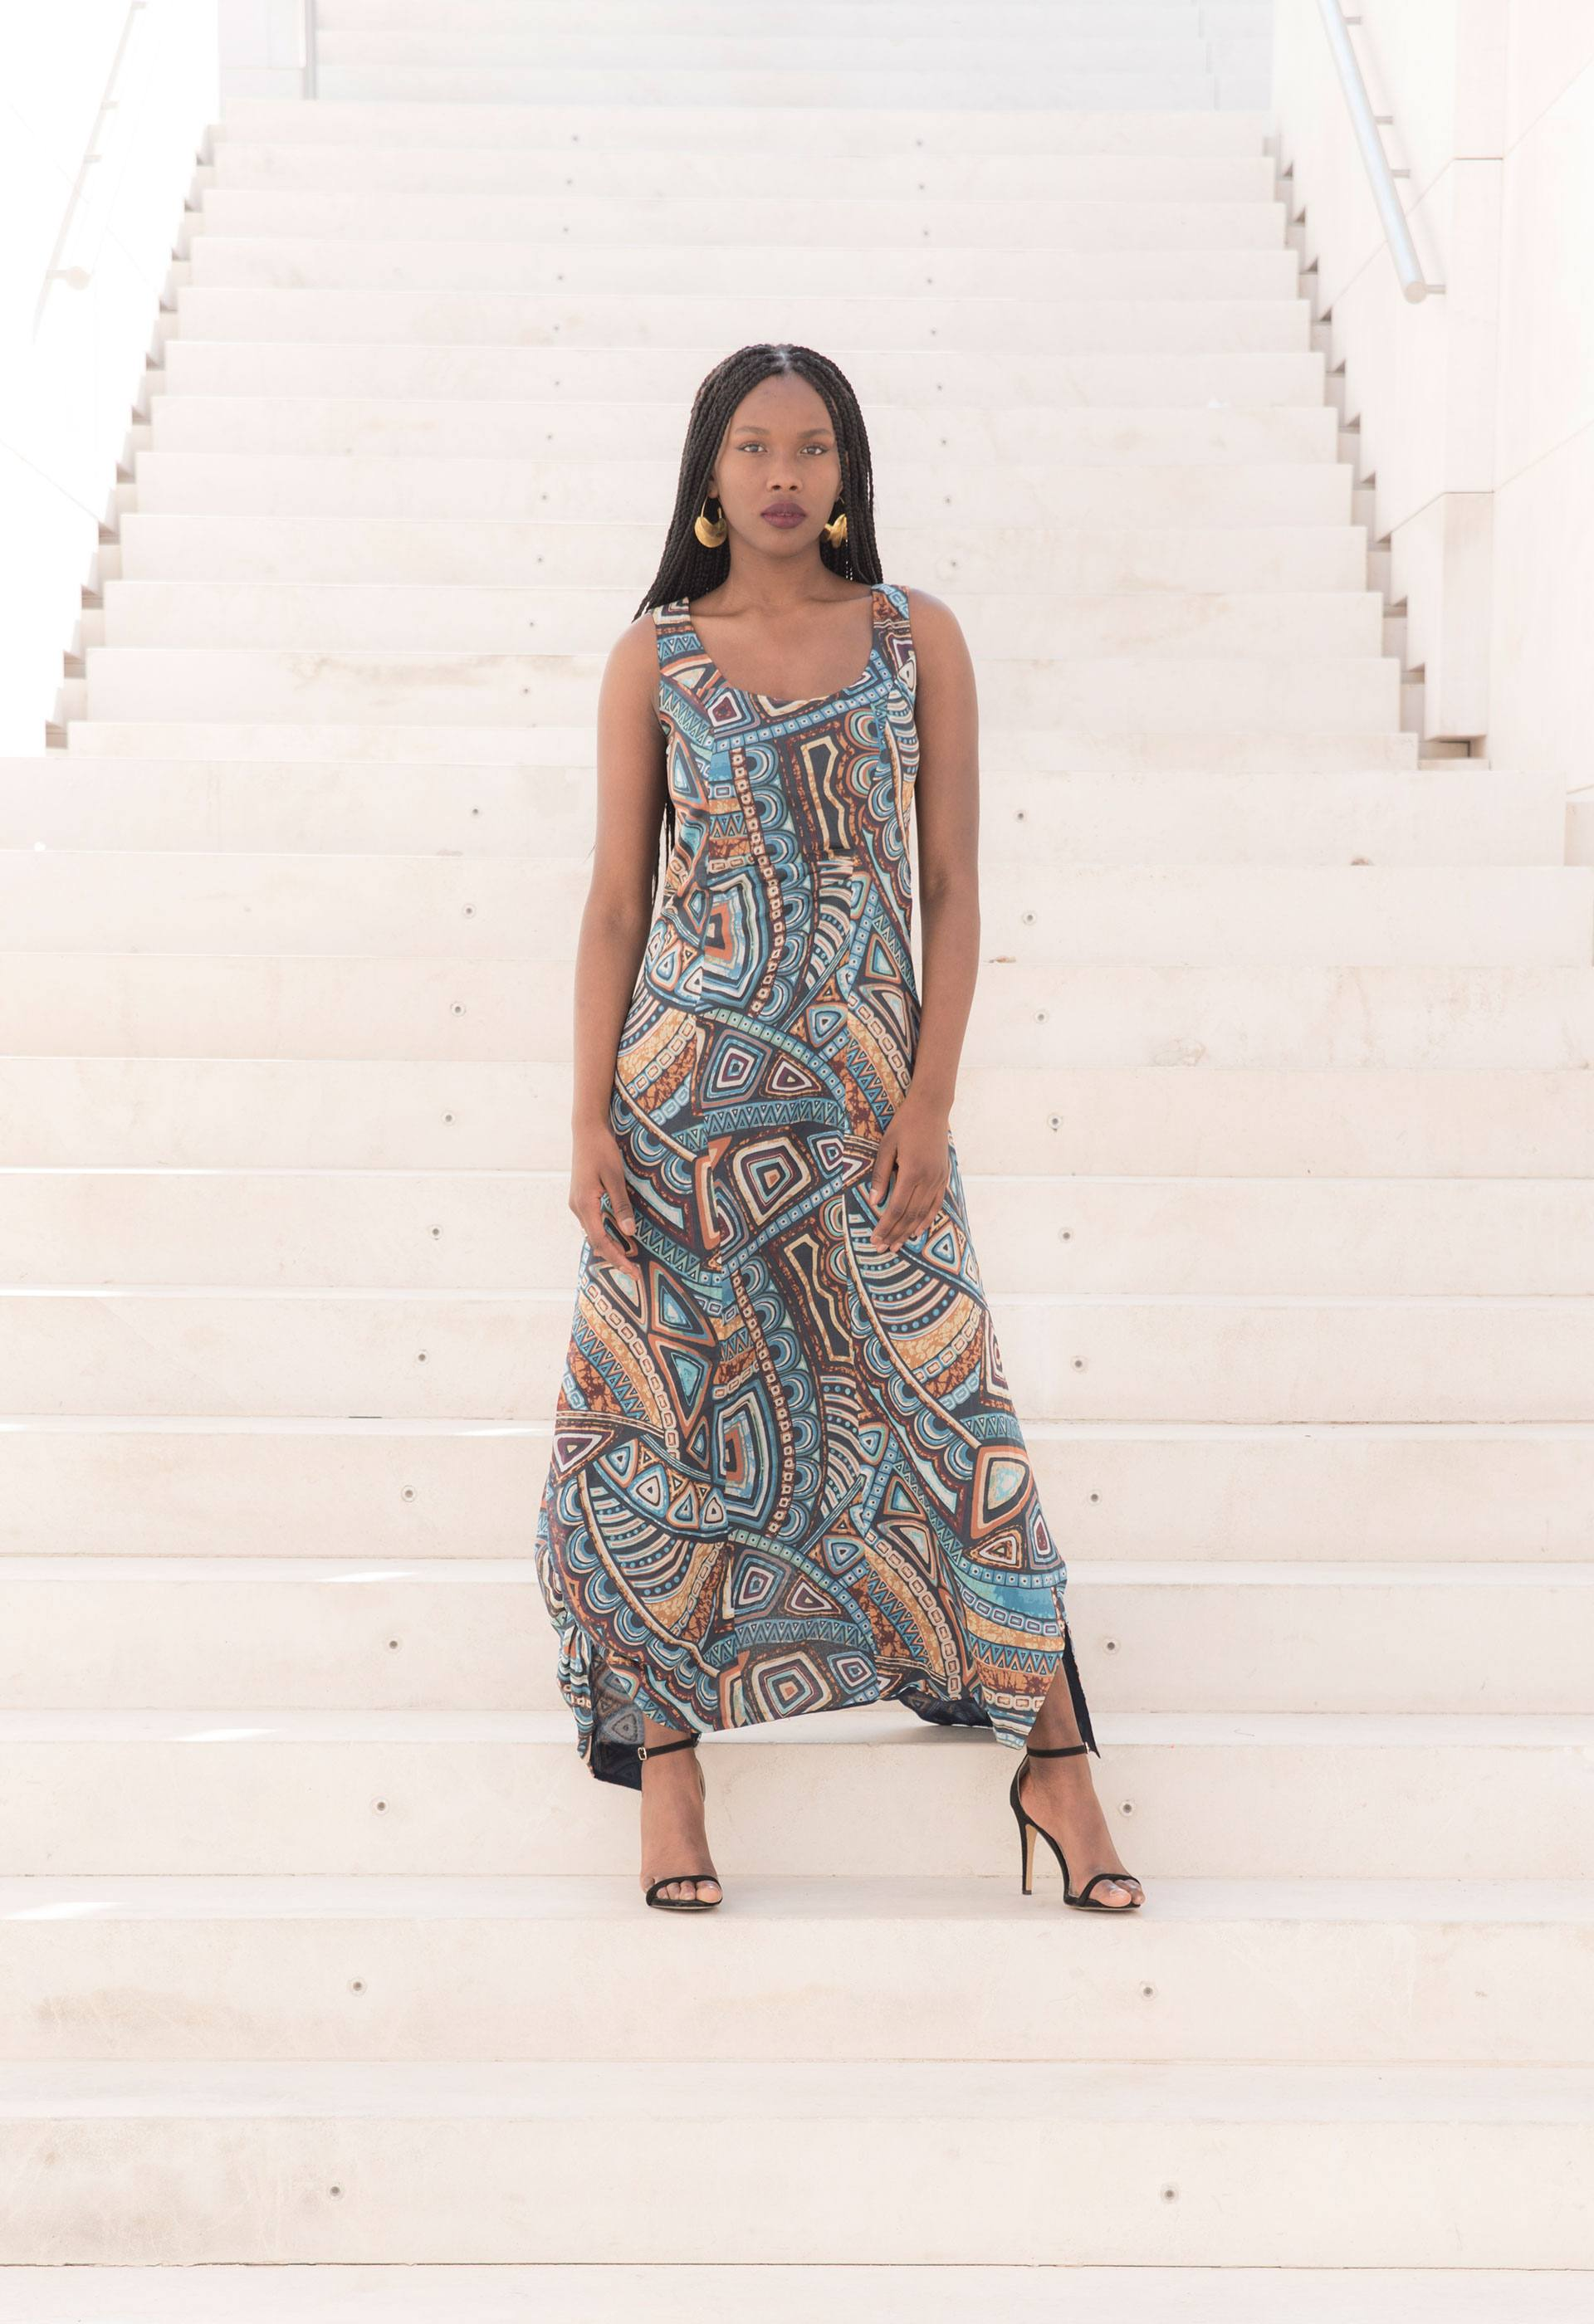 PRÊT À PORTER-NEW LIMITED EDITION - VESTIDOS ÉTNICOS - Vestido largo con tejido étnico africano